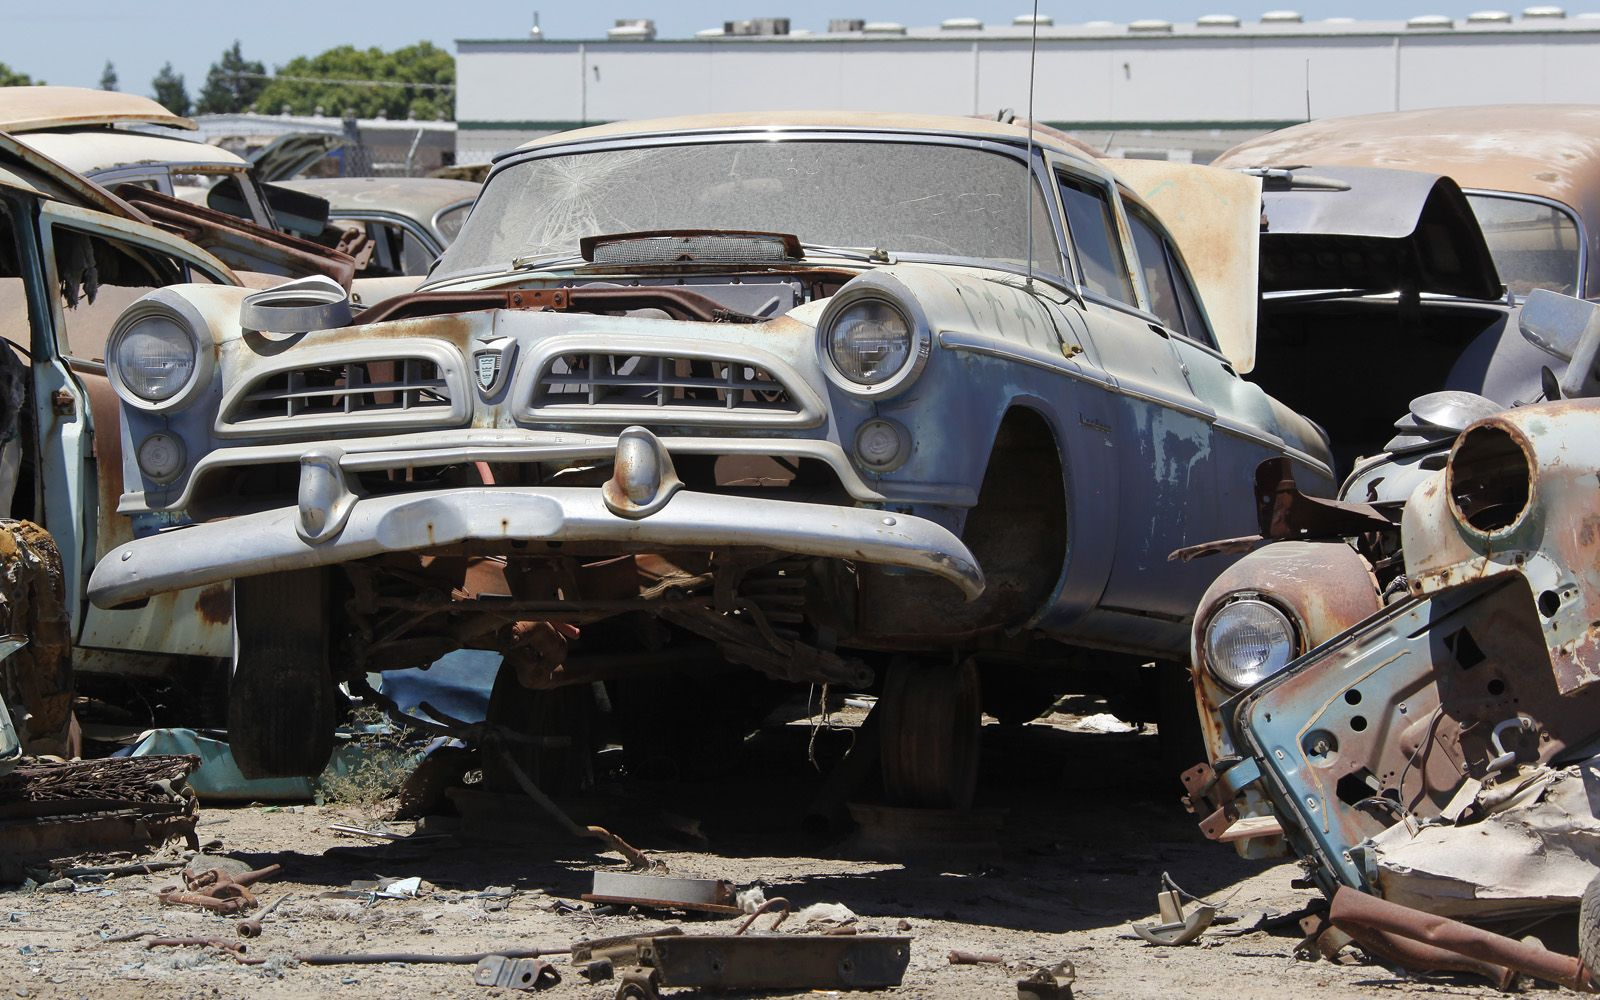 junkyard-vintage-cars-turners-auto-wrecking-fresno-california-260 ...